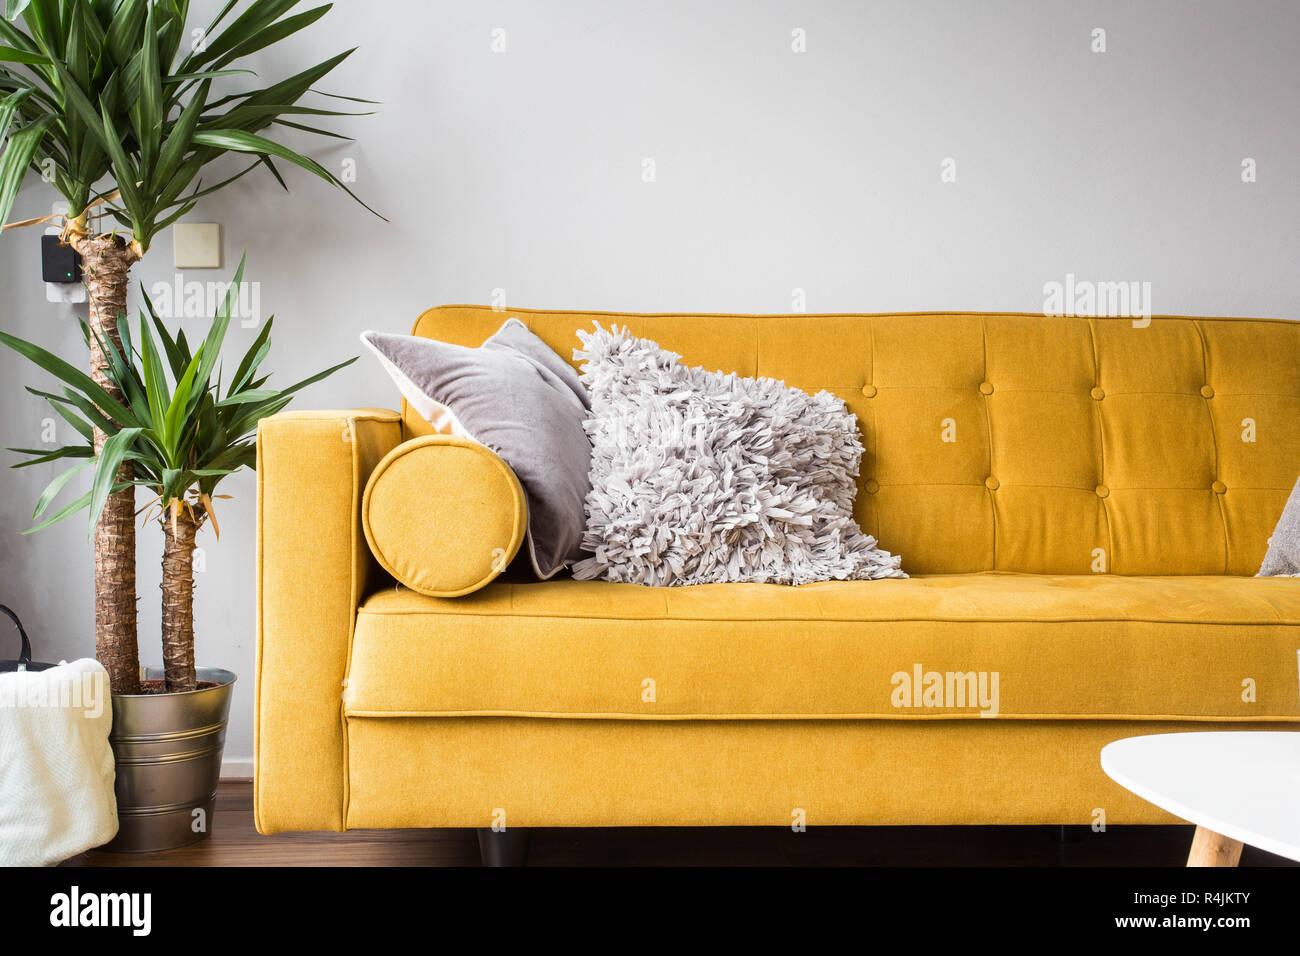 Stylish living room interior with comfortable yellow sofa and green ...